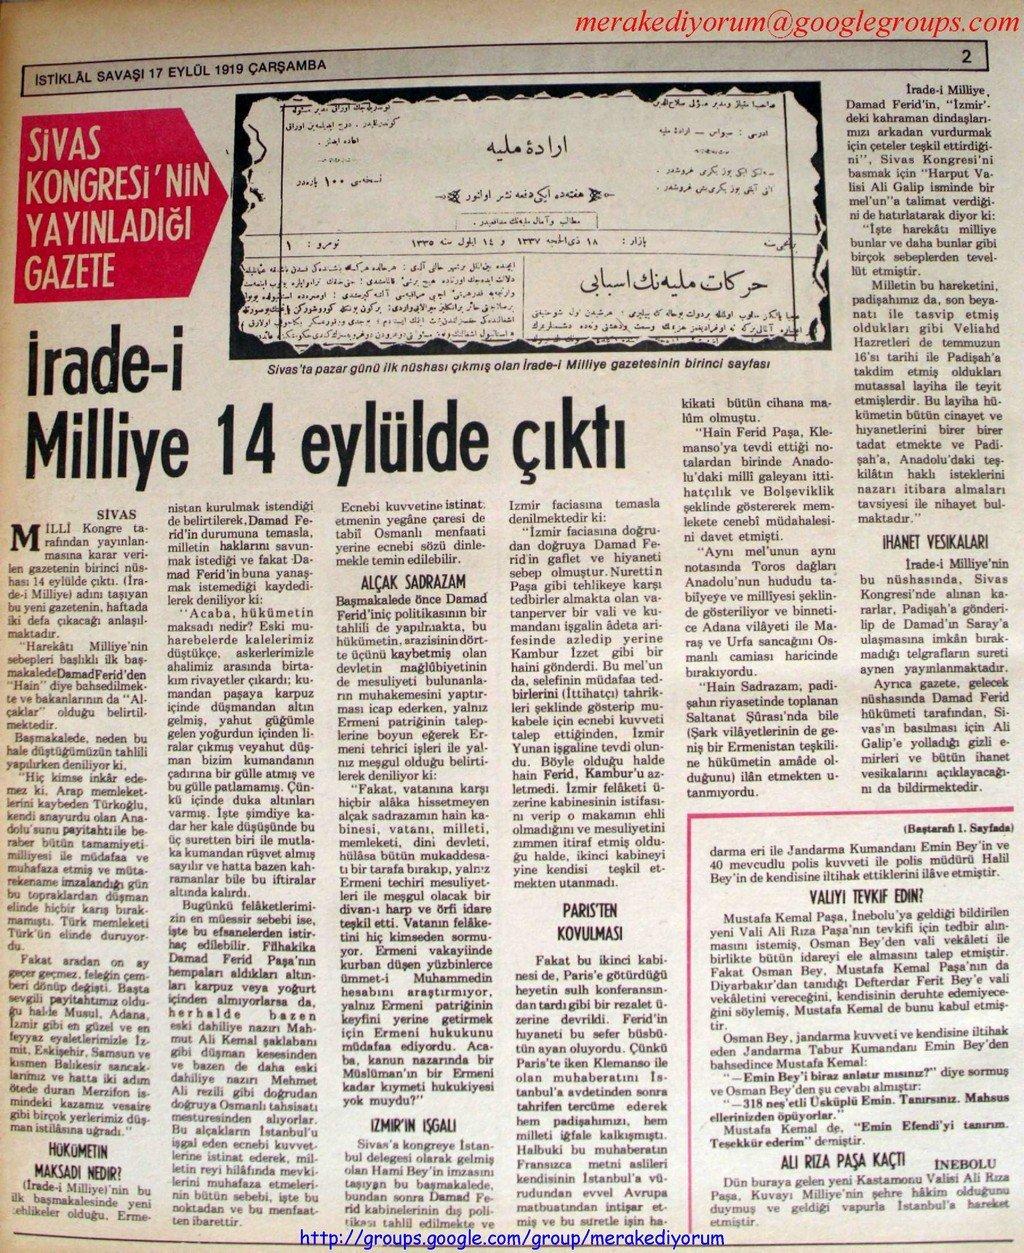 istiklal savaşı gazetesi - 17 eylül 1919